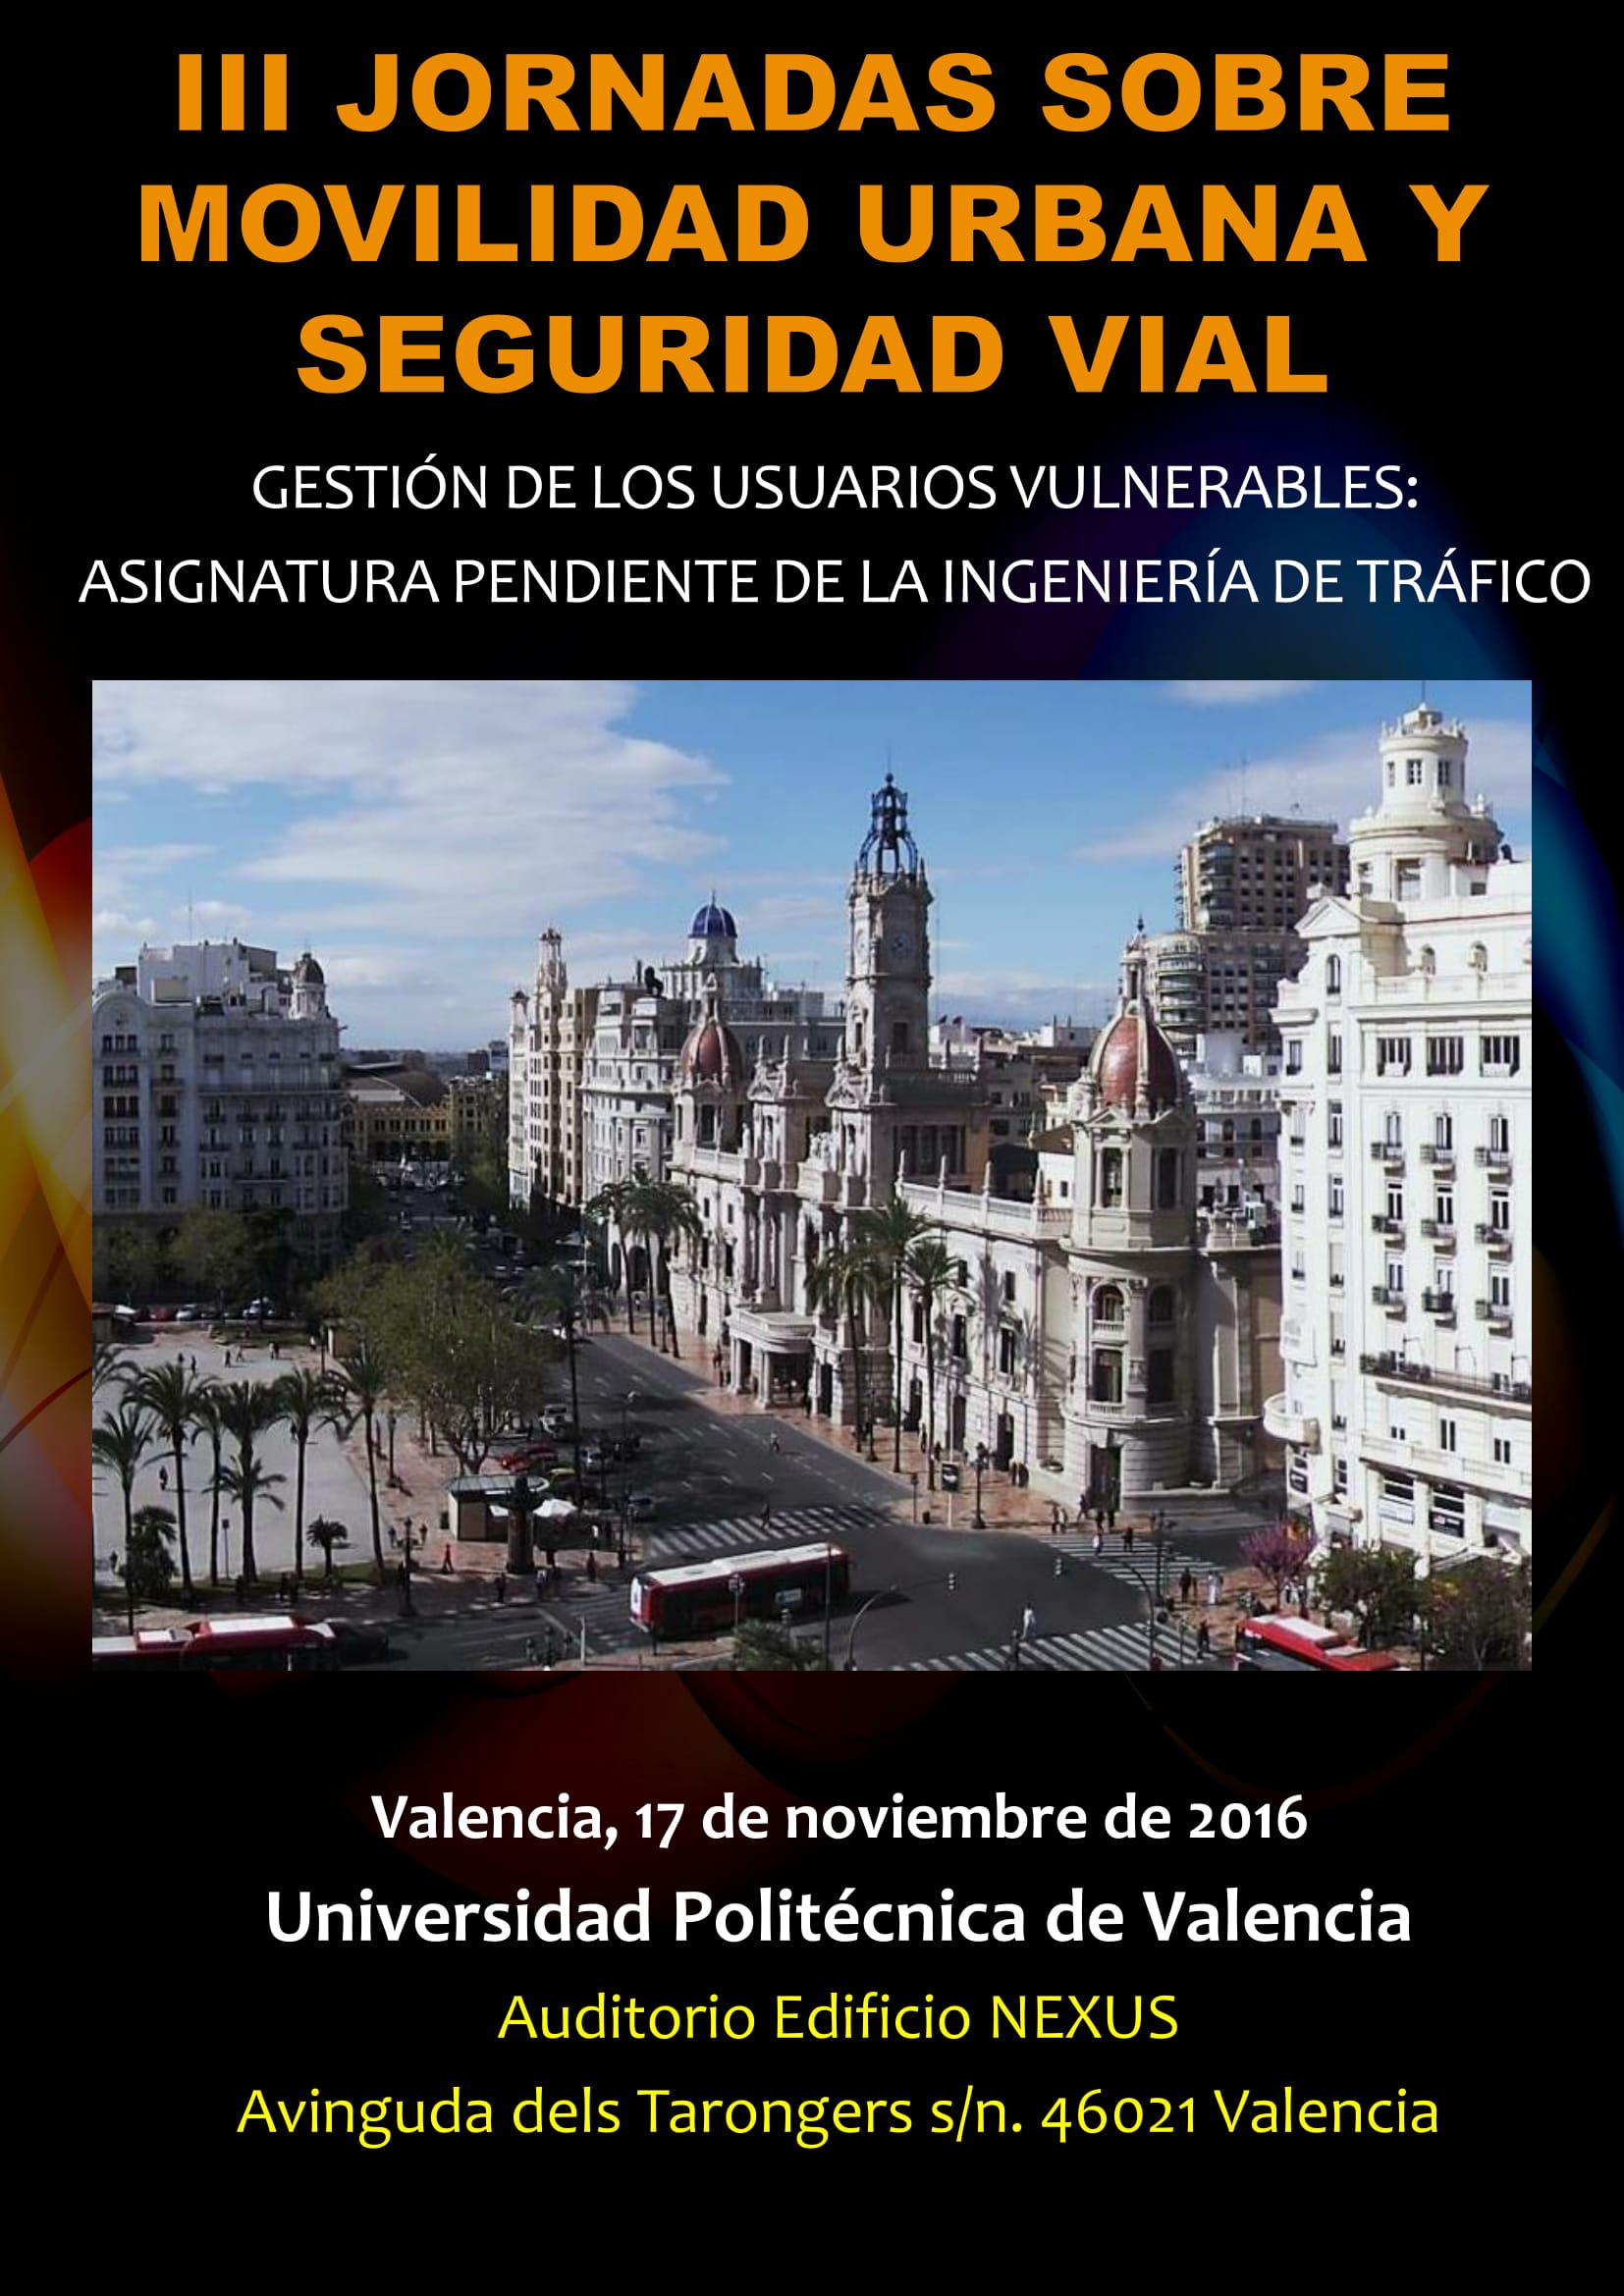 20161117-iii-jornada-movilidad-urb-seg-vial-01